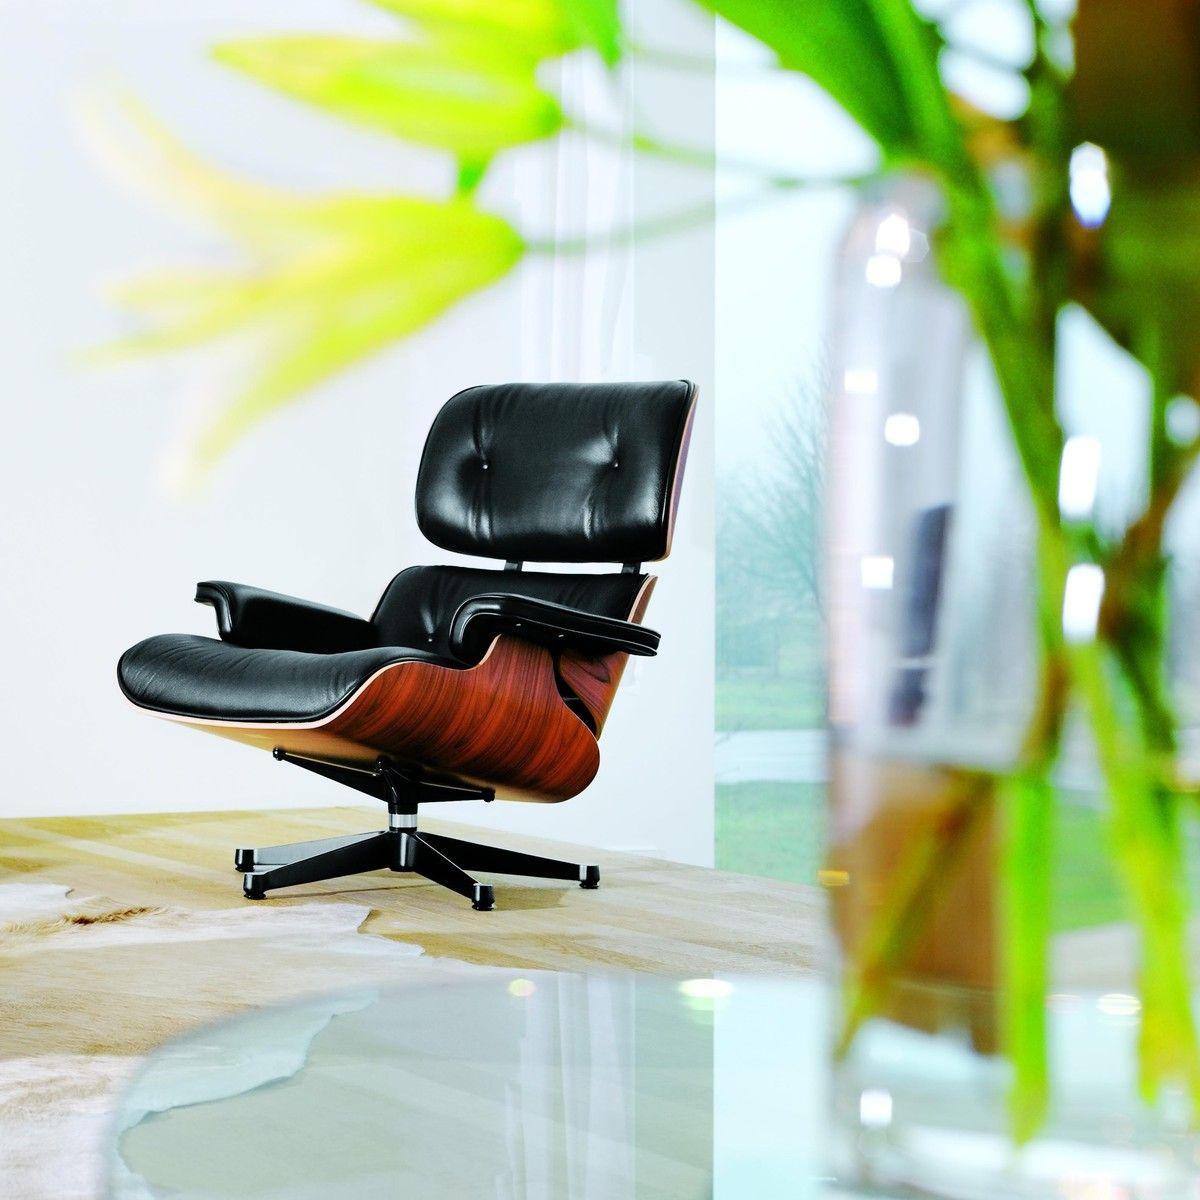 Eames Lounge Chair Drehsessel Leder Drehsessel Lounge Chair Sessel